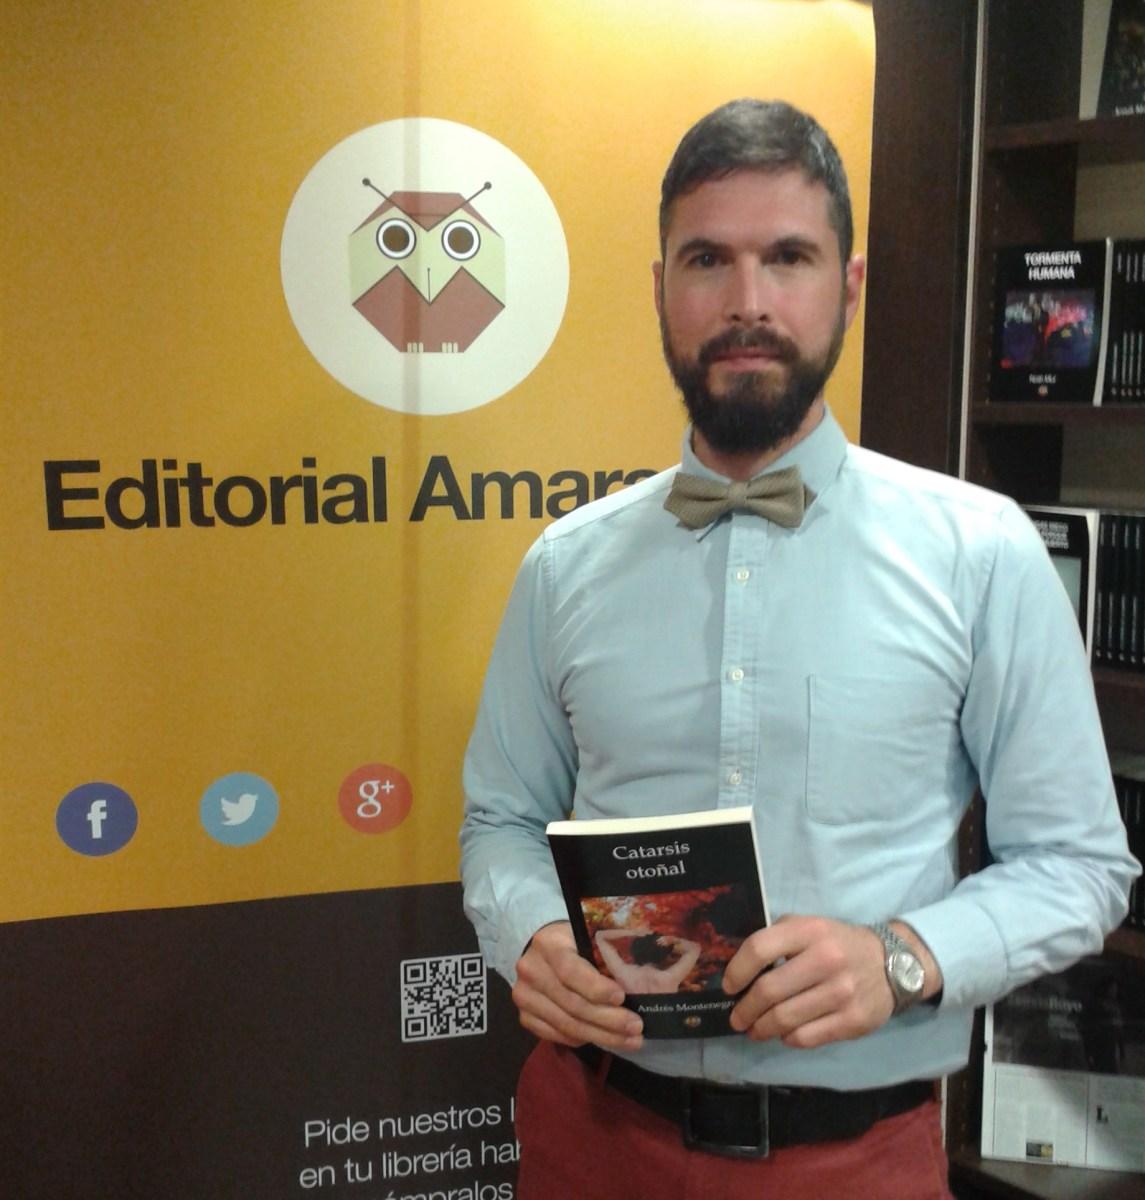 Catarsis otoñal: Andrés Montenegro presentó su primera novela